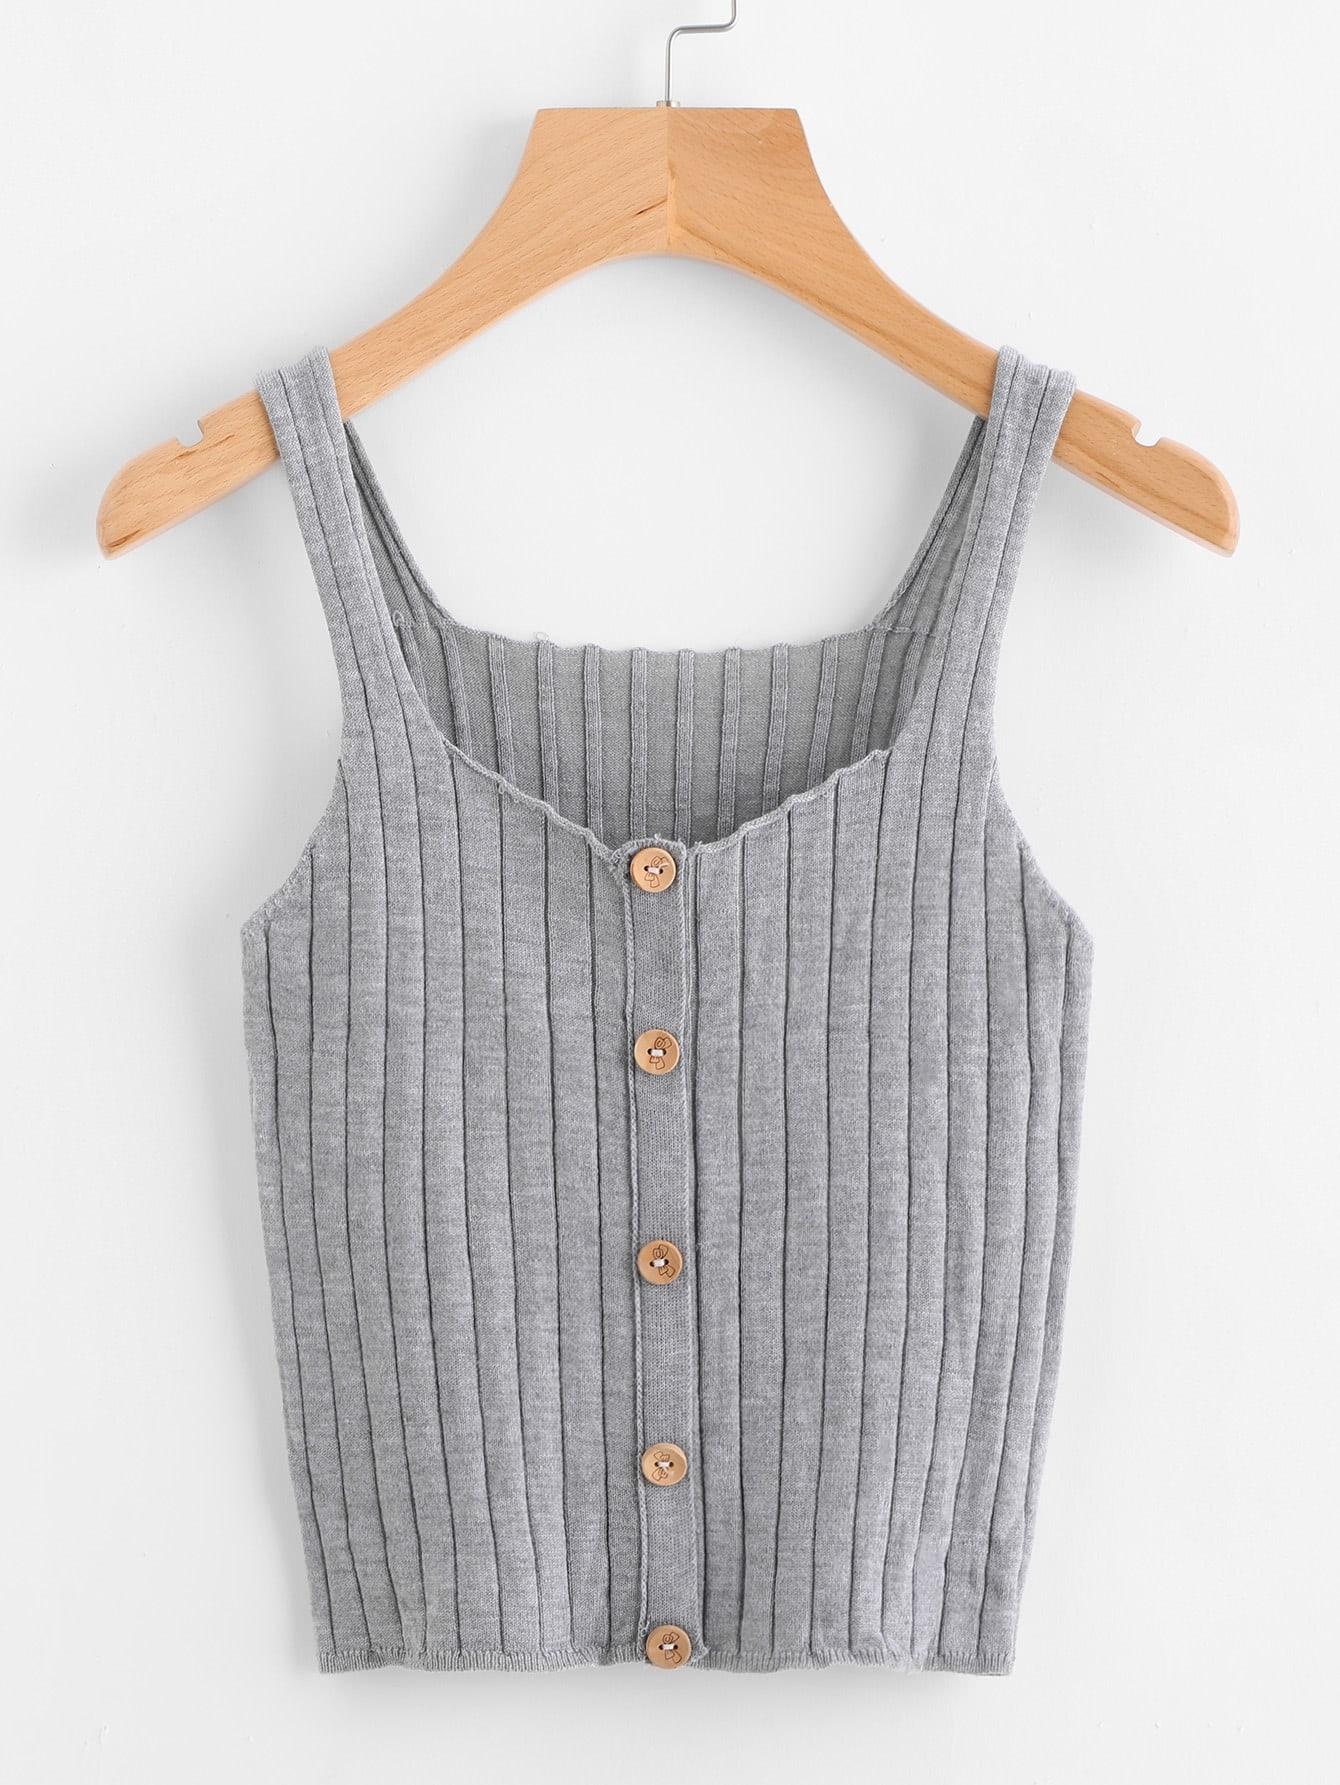 Button Front Rib Knit Top vest170712451